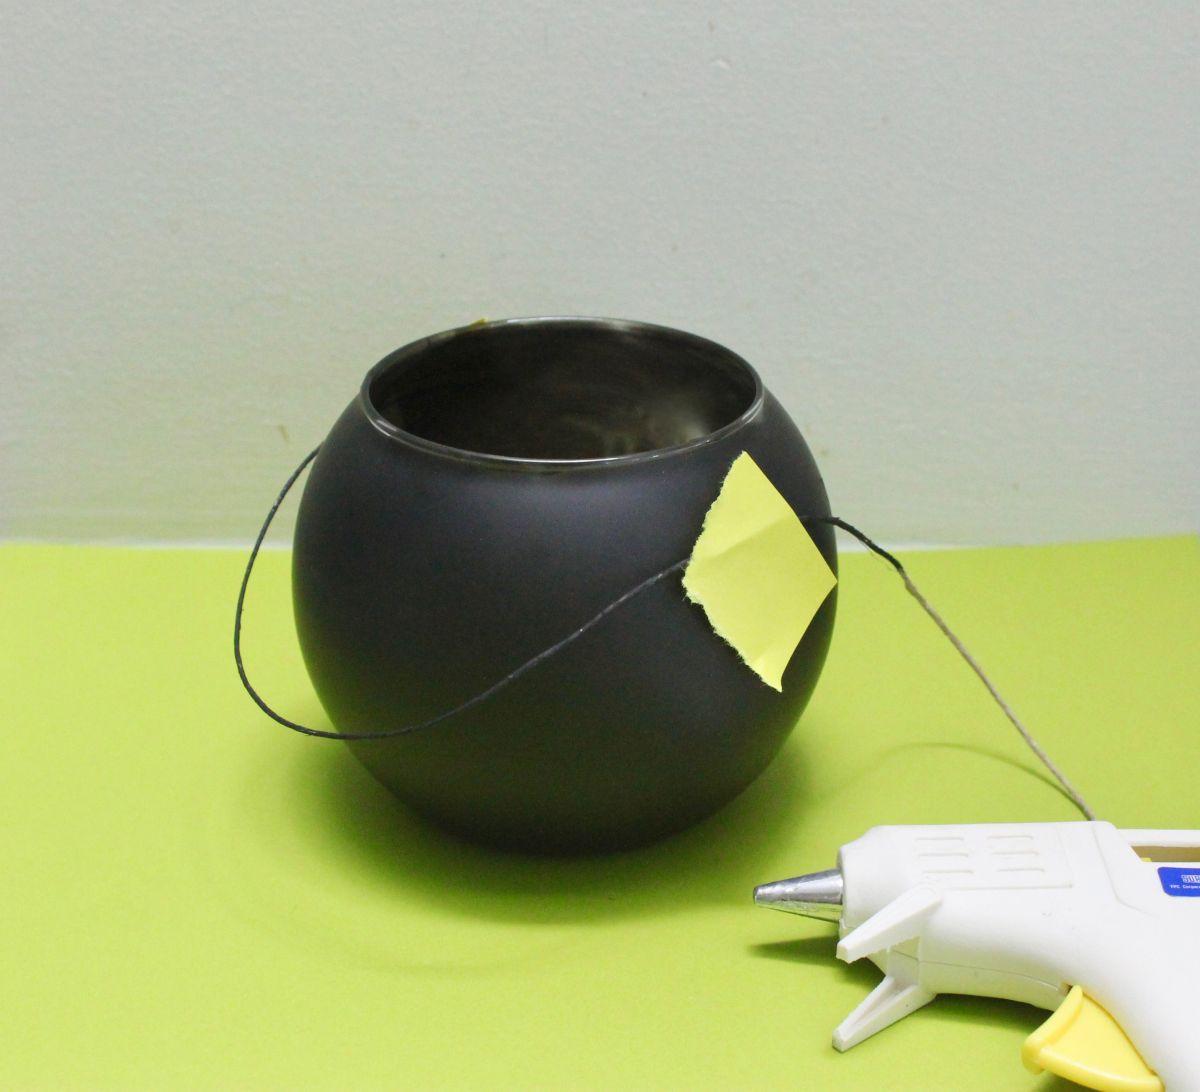 How to make the Cauldron candle glue